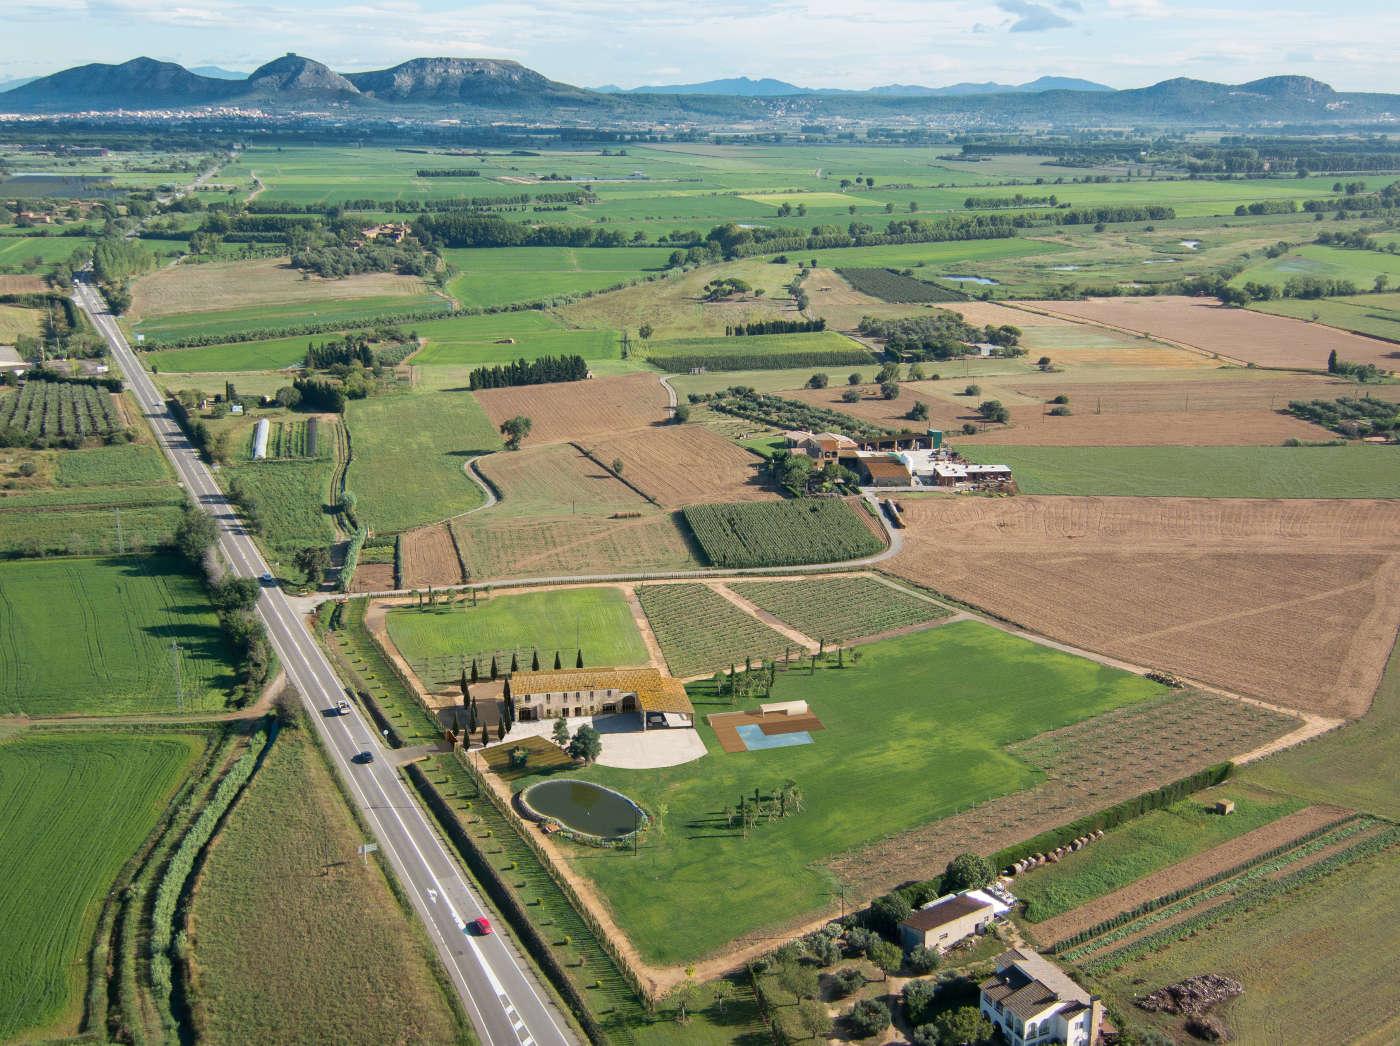 Masia en venta Pals Baix Emporda Girona, Cases Singulars